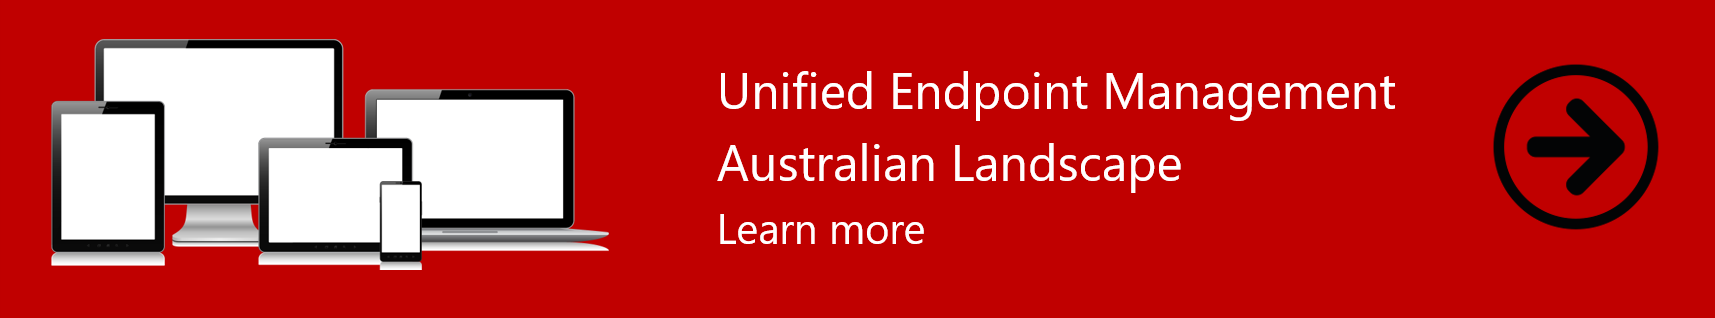 UEM Australian Landscape